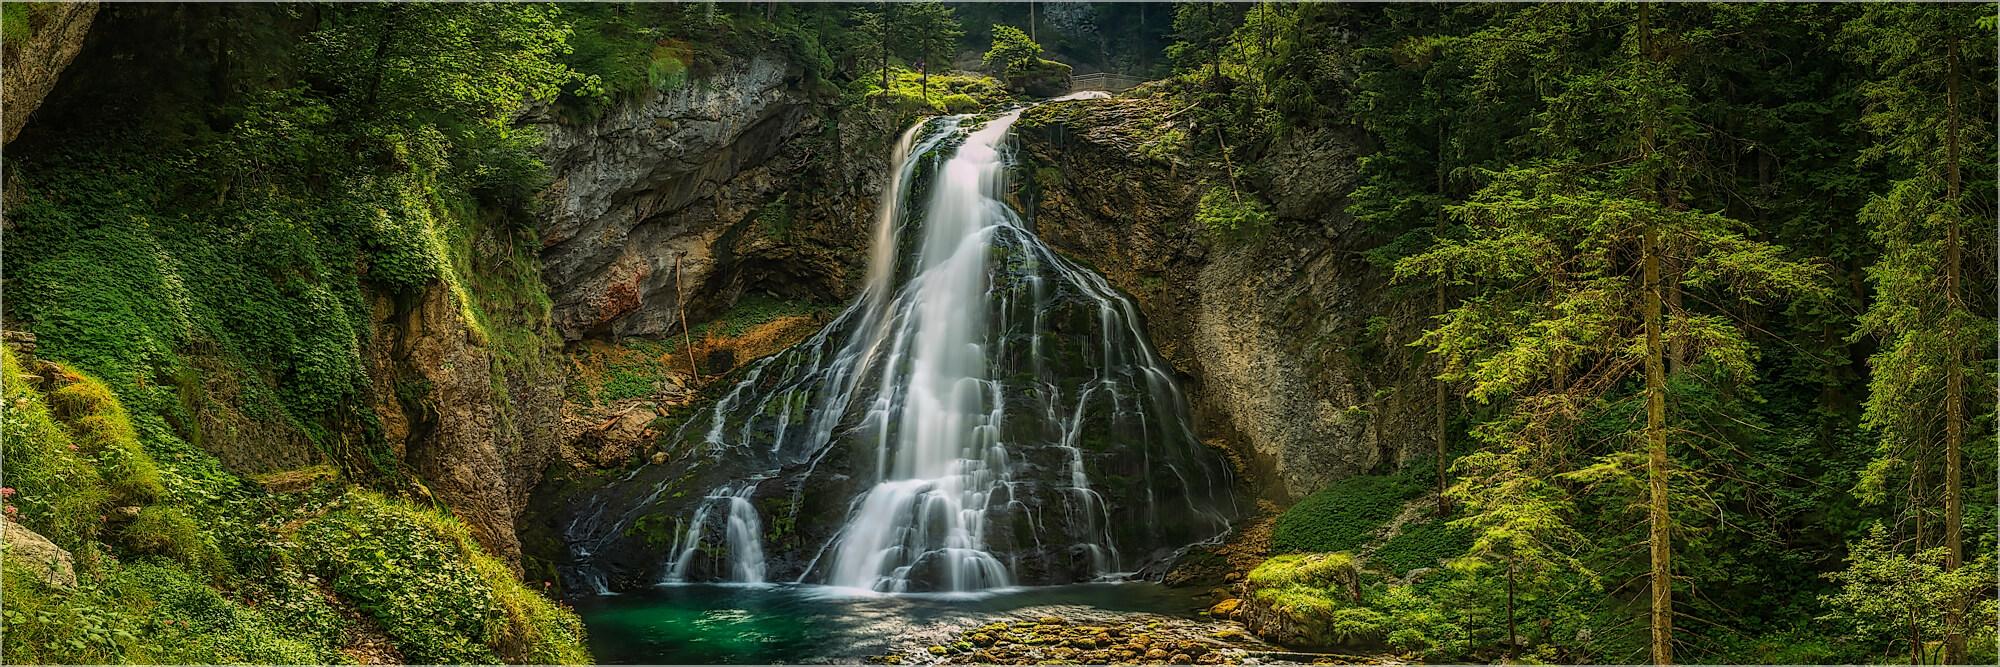 Panoramabild Gollinger Wasserfall Golling Österreich